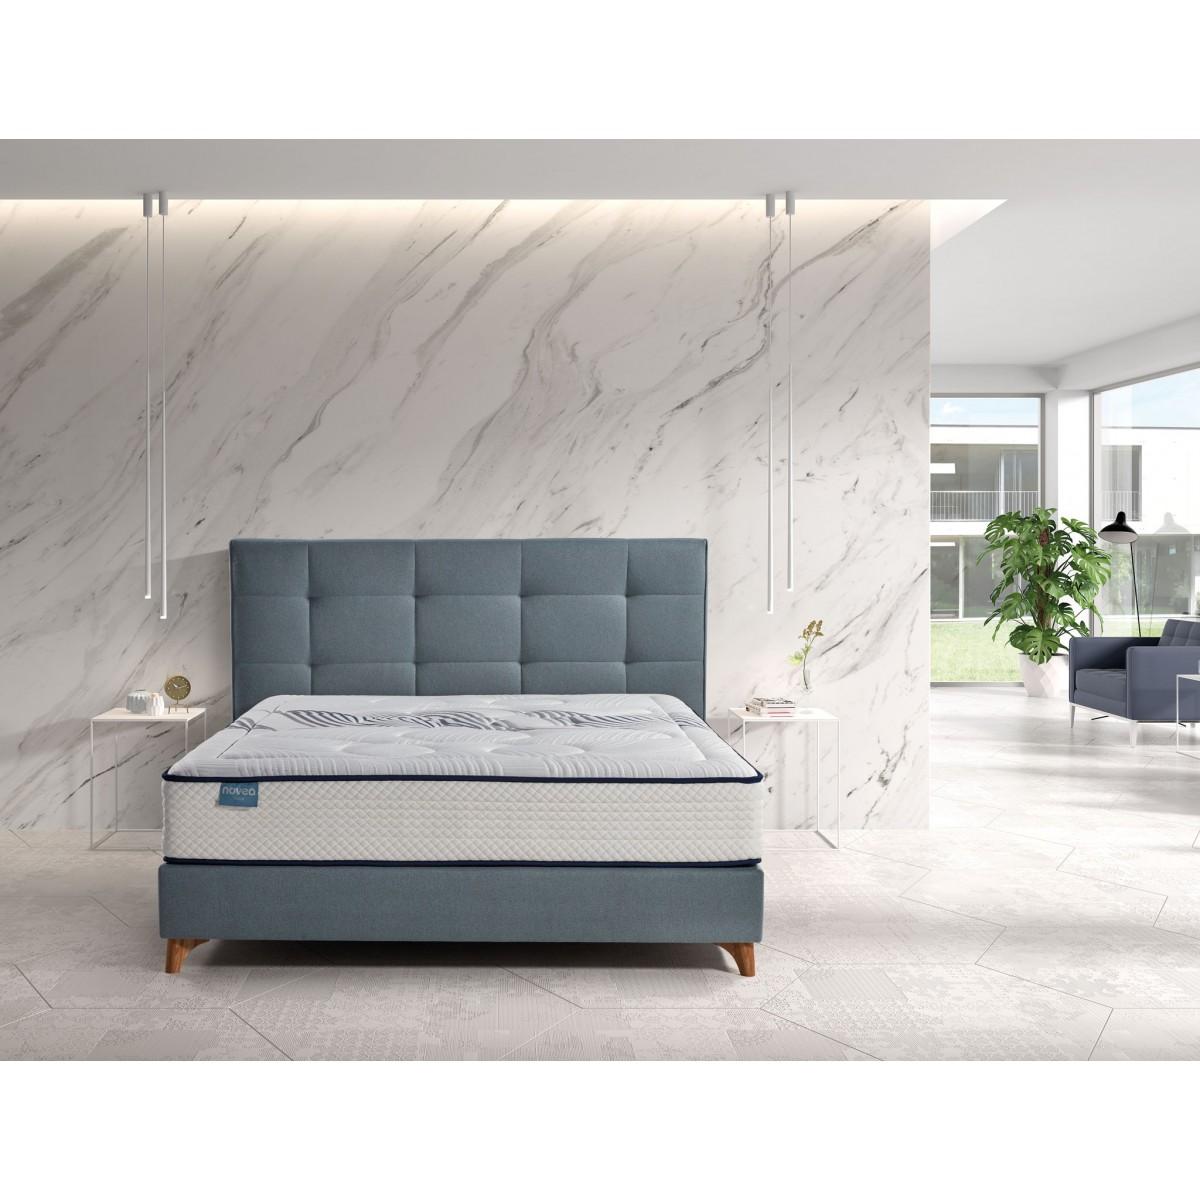 matelas black label extra touch matelas. Black Bedroom Furniture Sets. Home Design Ideas